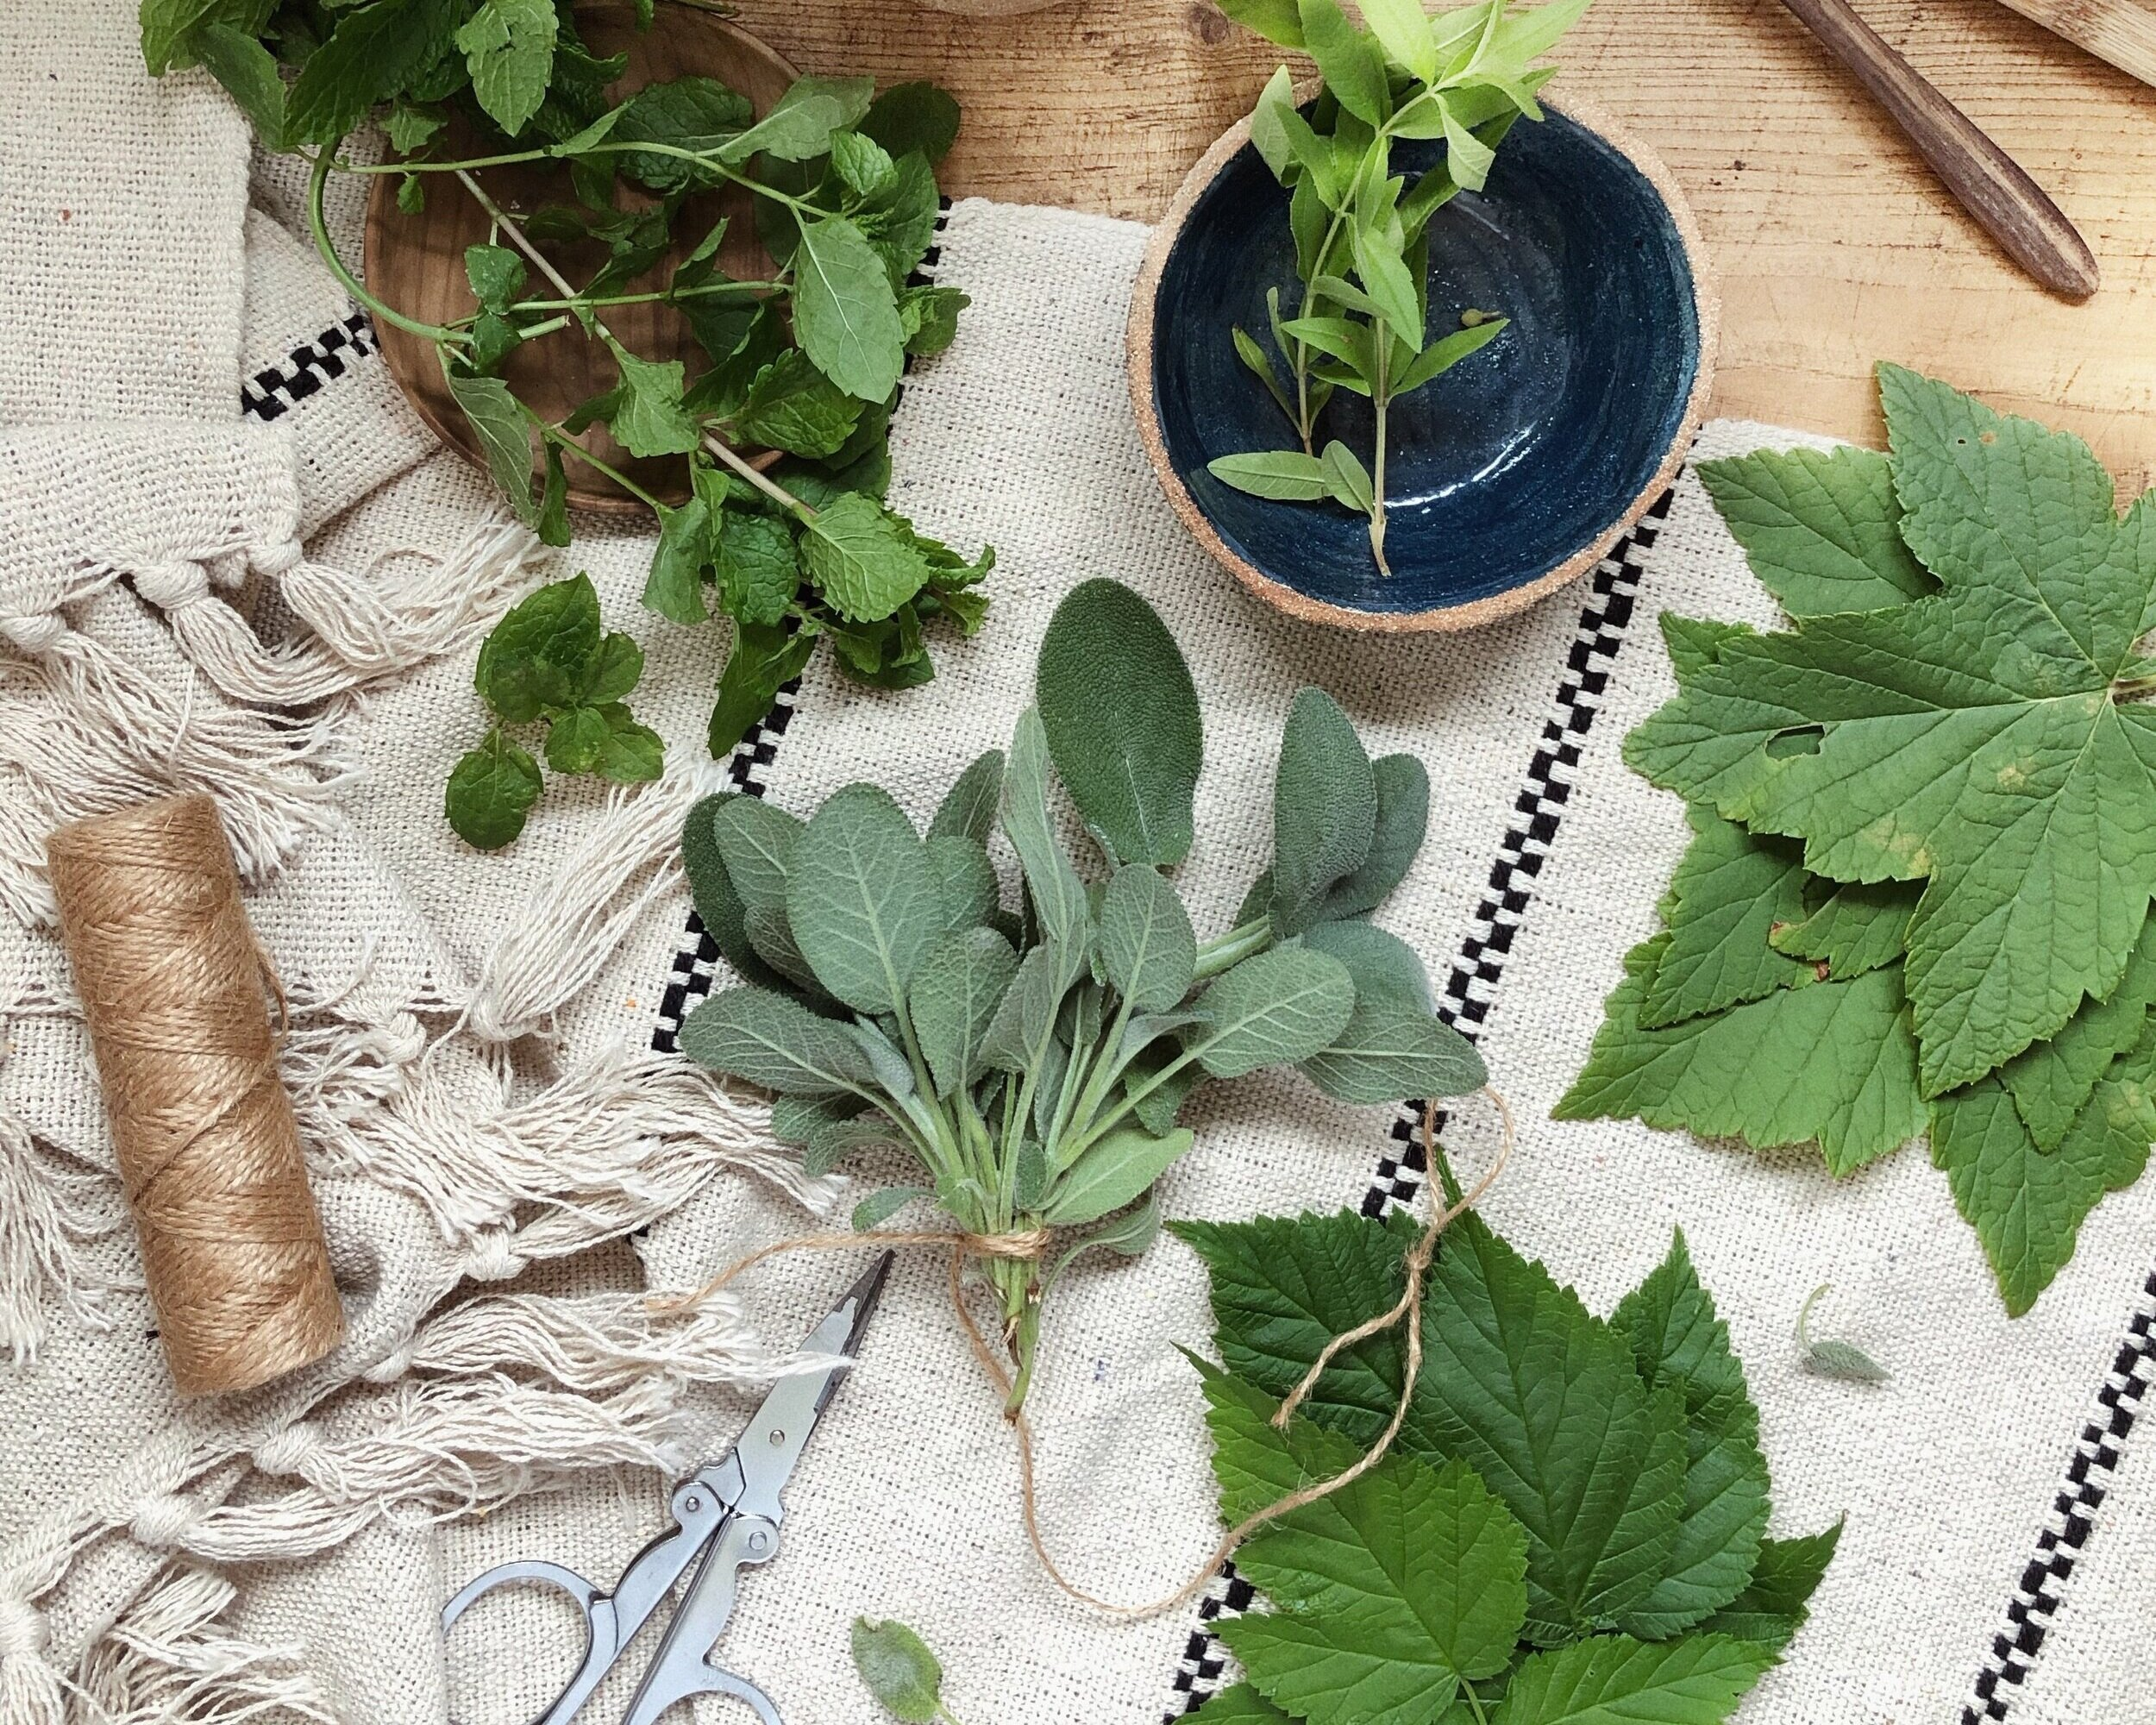 DIY herbal tea - make your own plastic-free tea, zero waste - 4 recipes